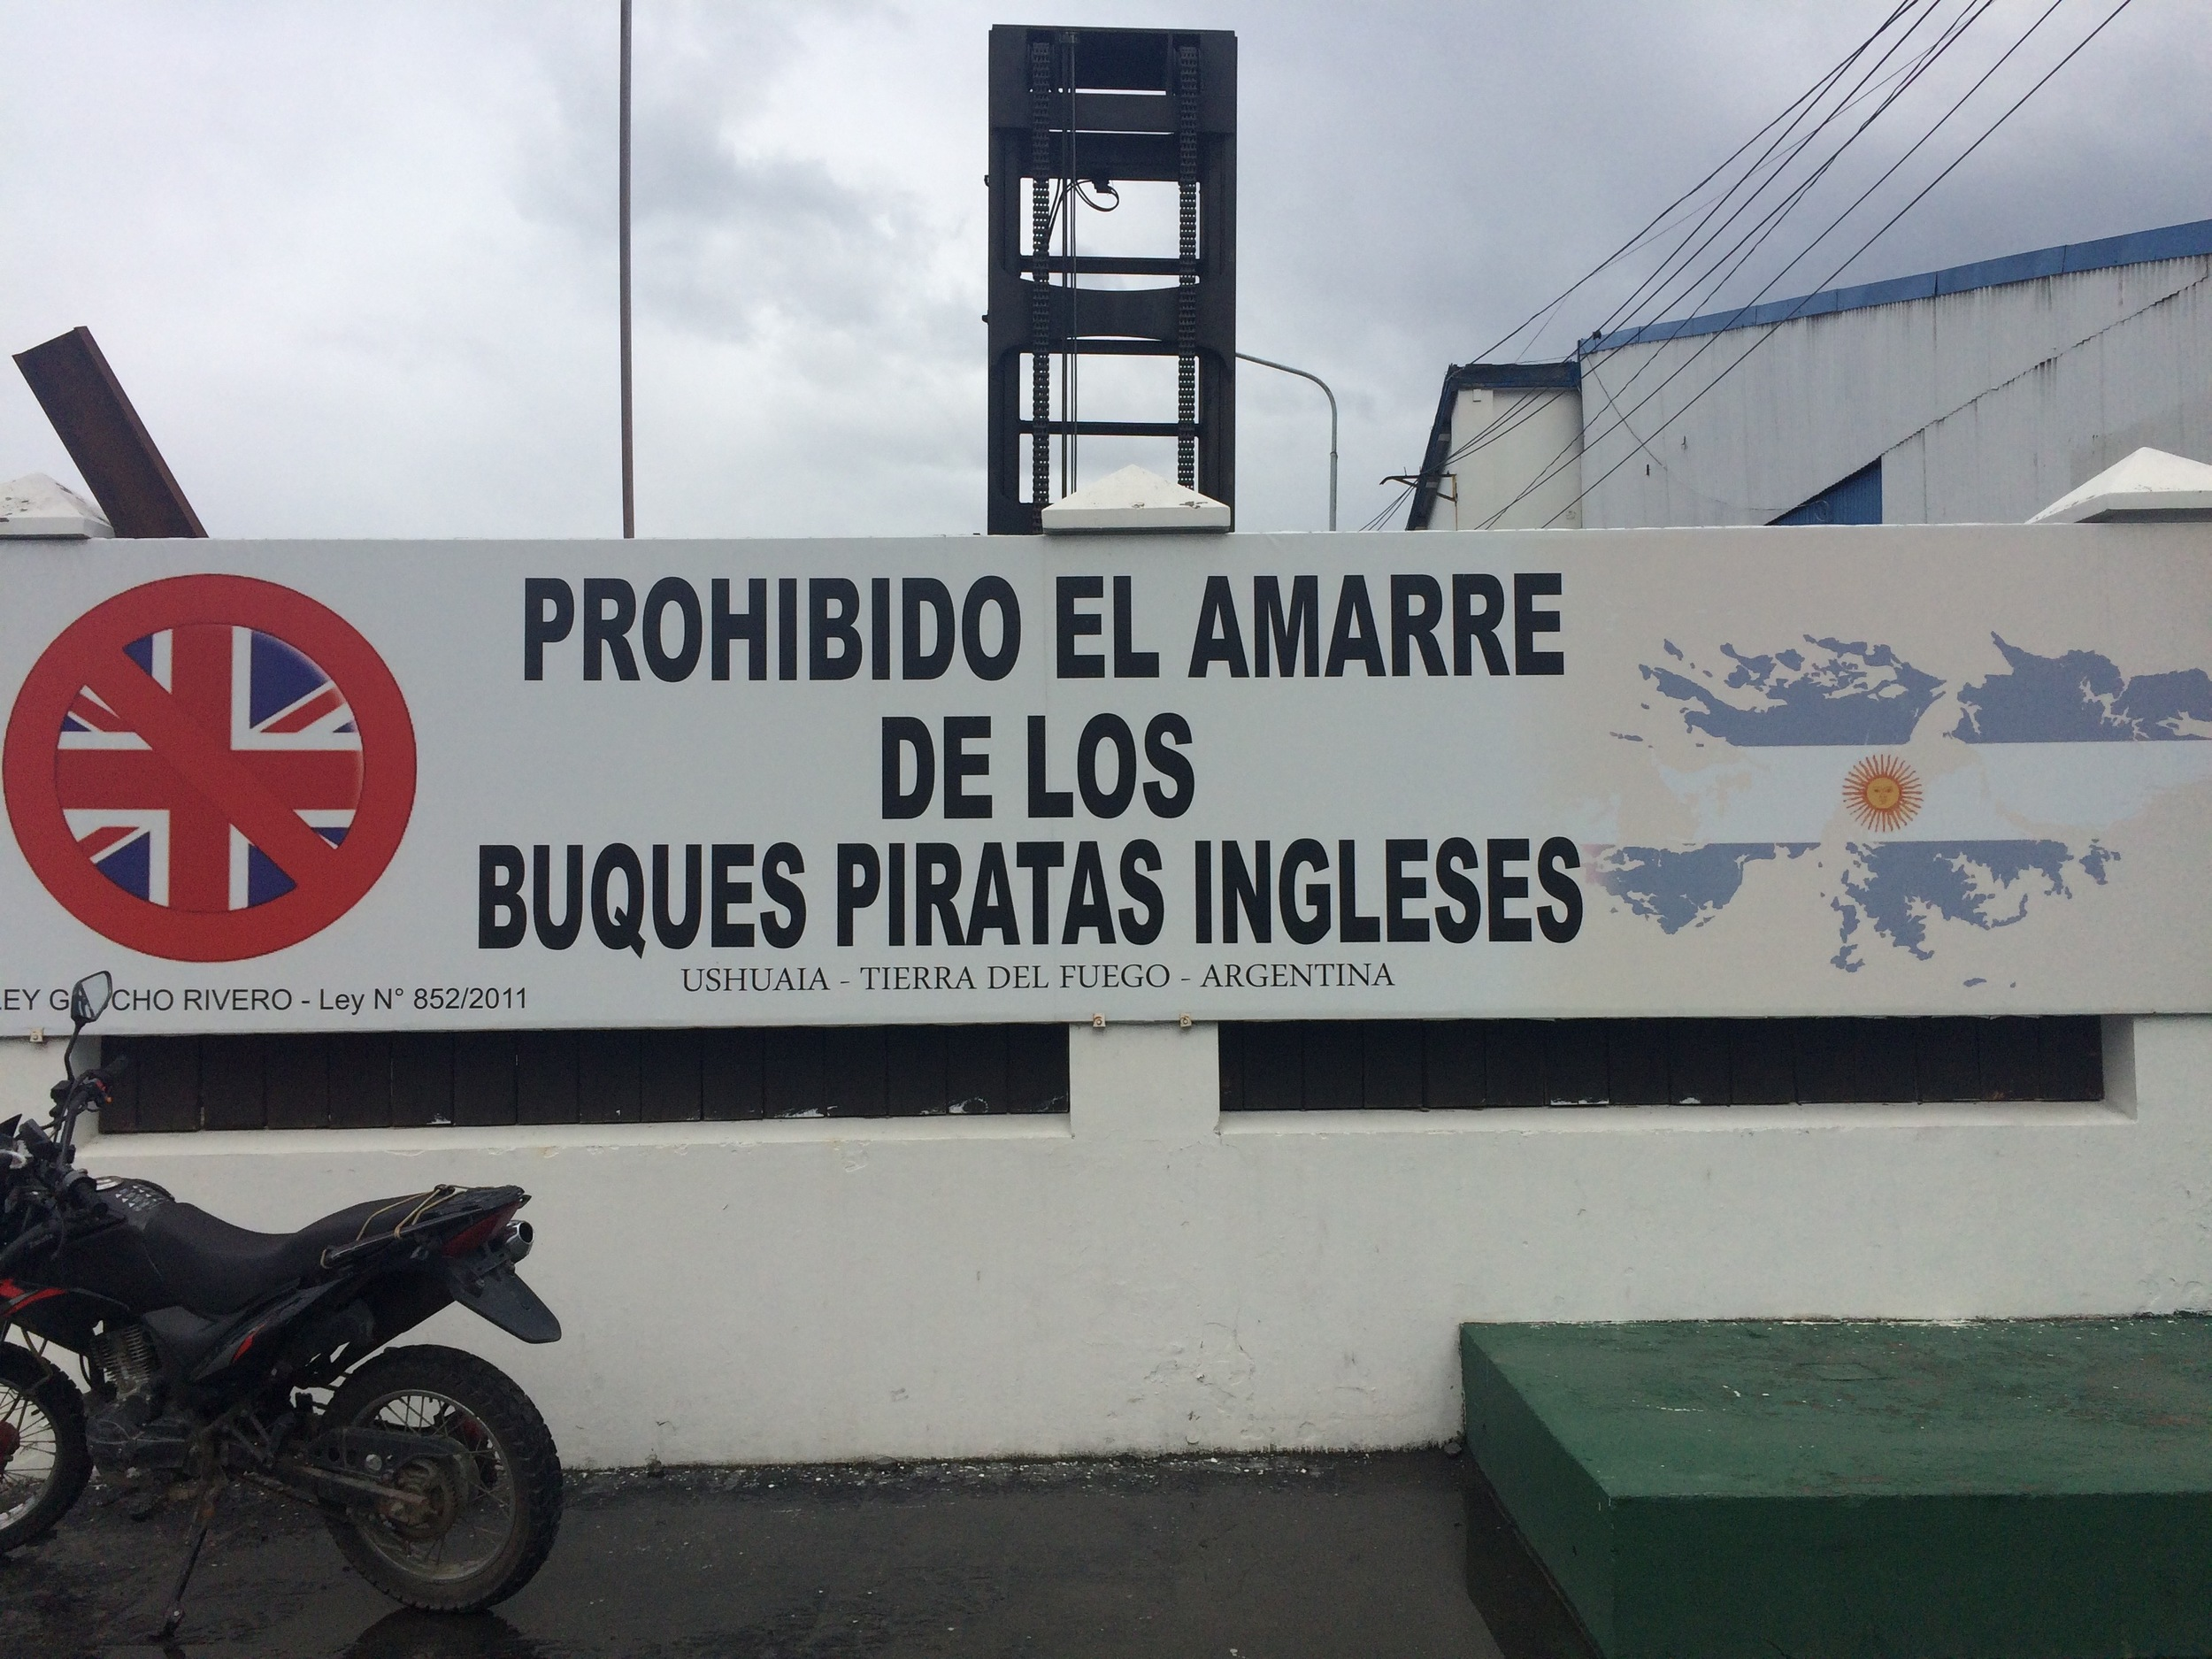 Sorry Cap'n Pugwash...no English pirates allowed